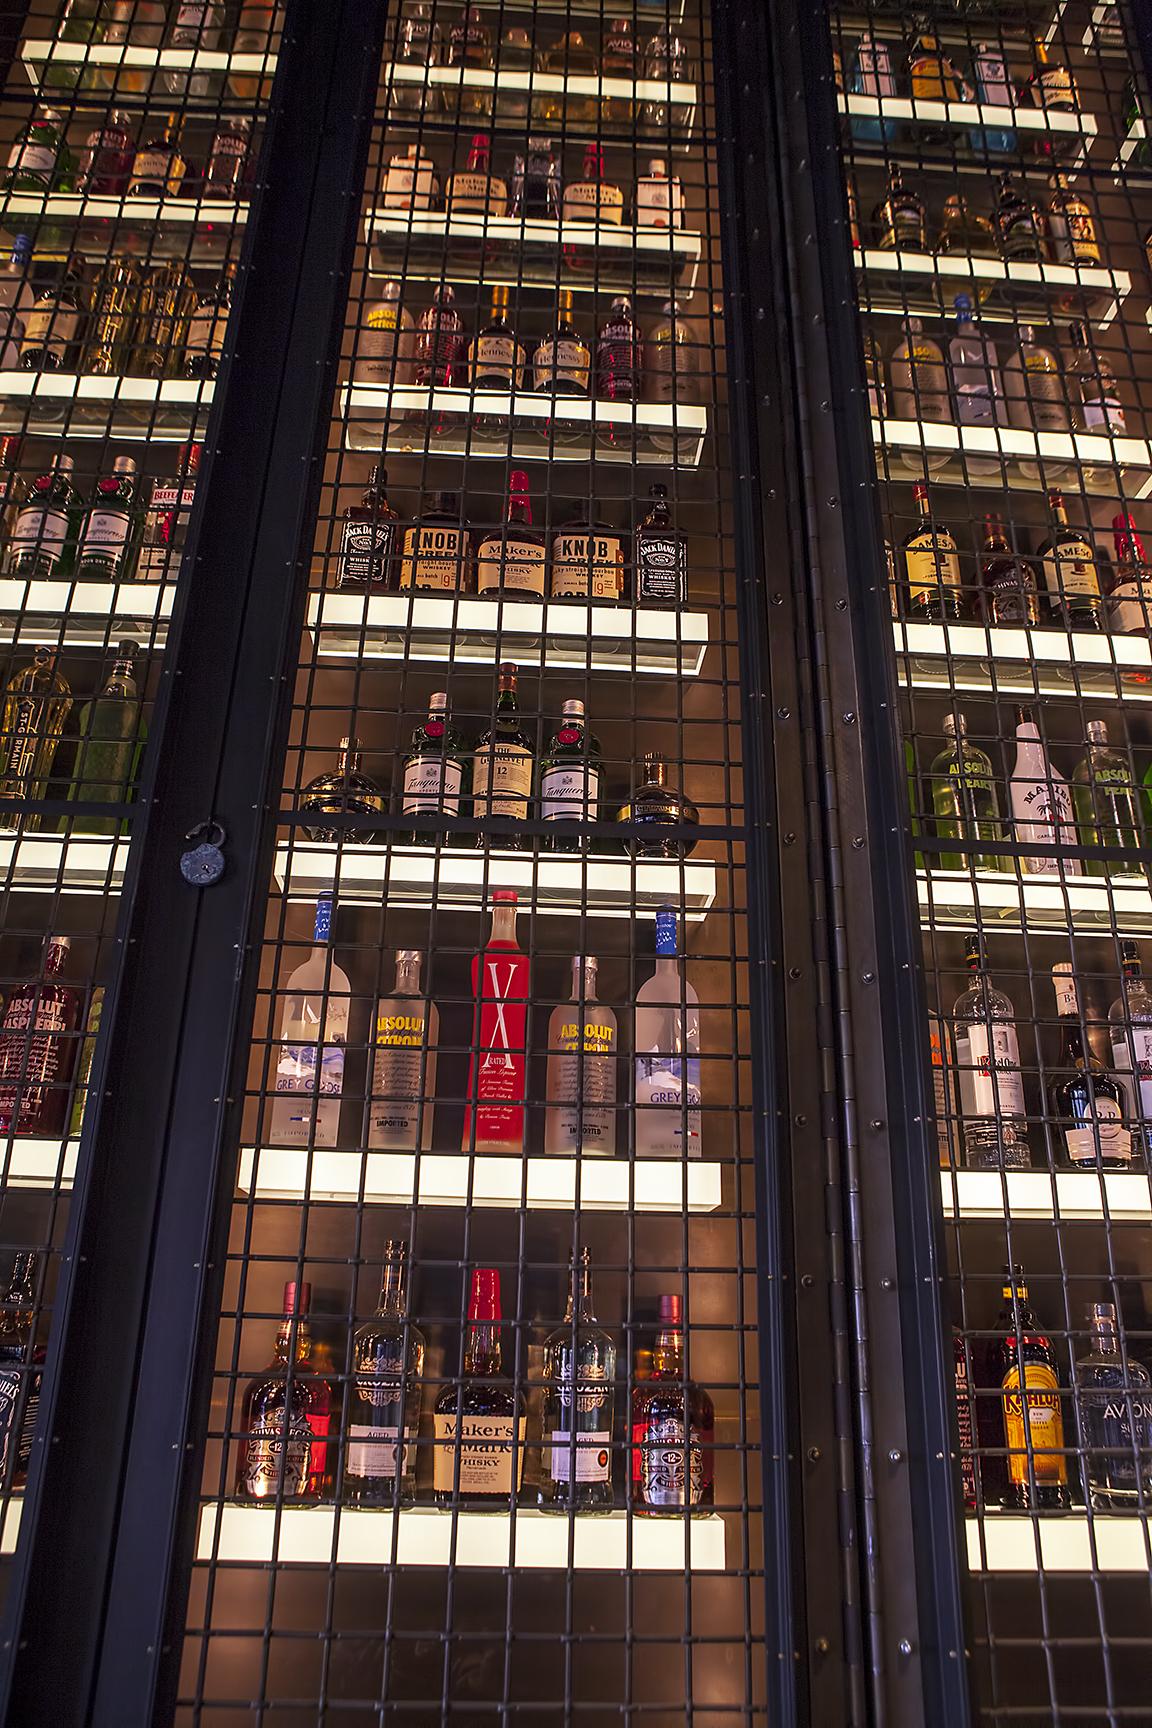 Backbar Bottle Display